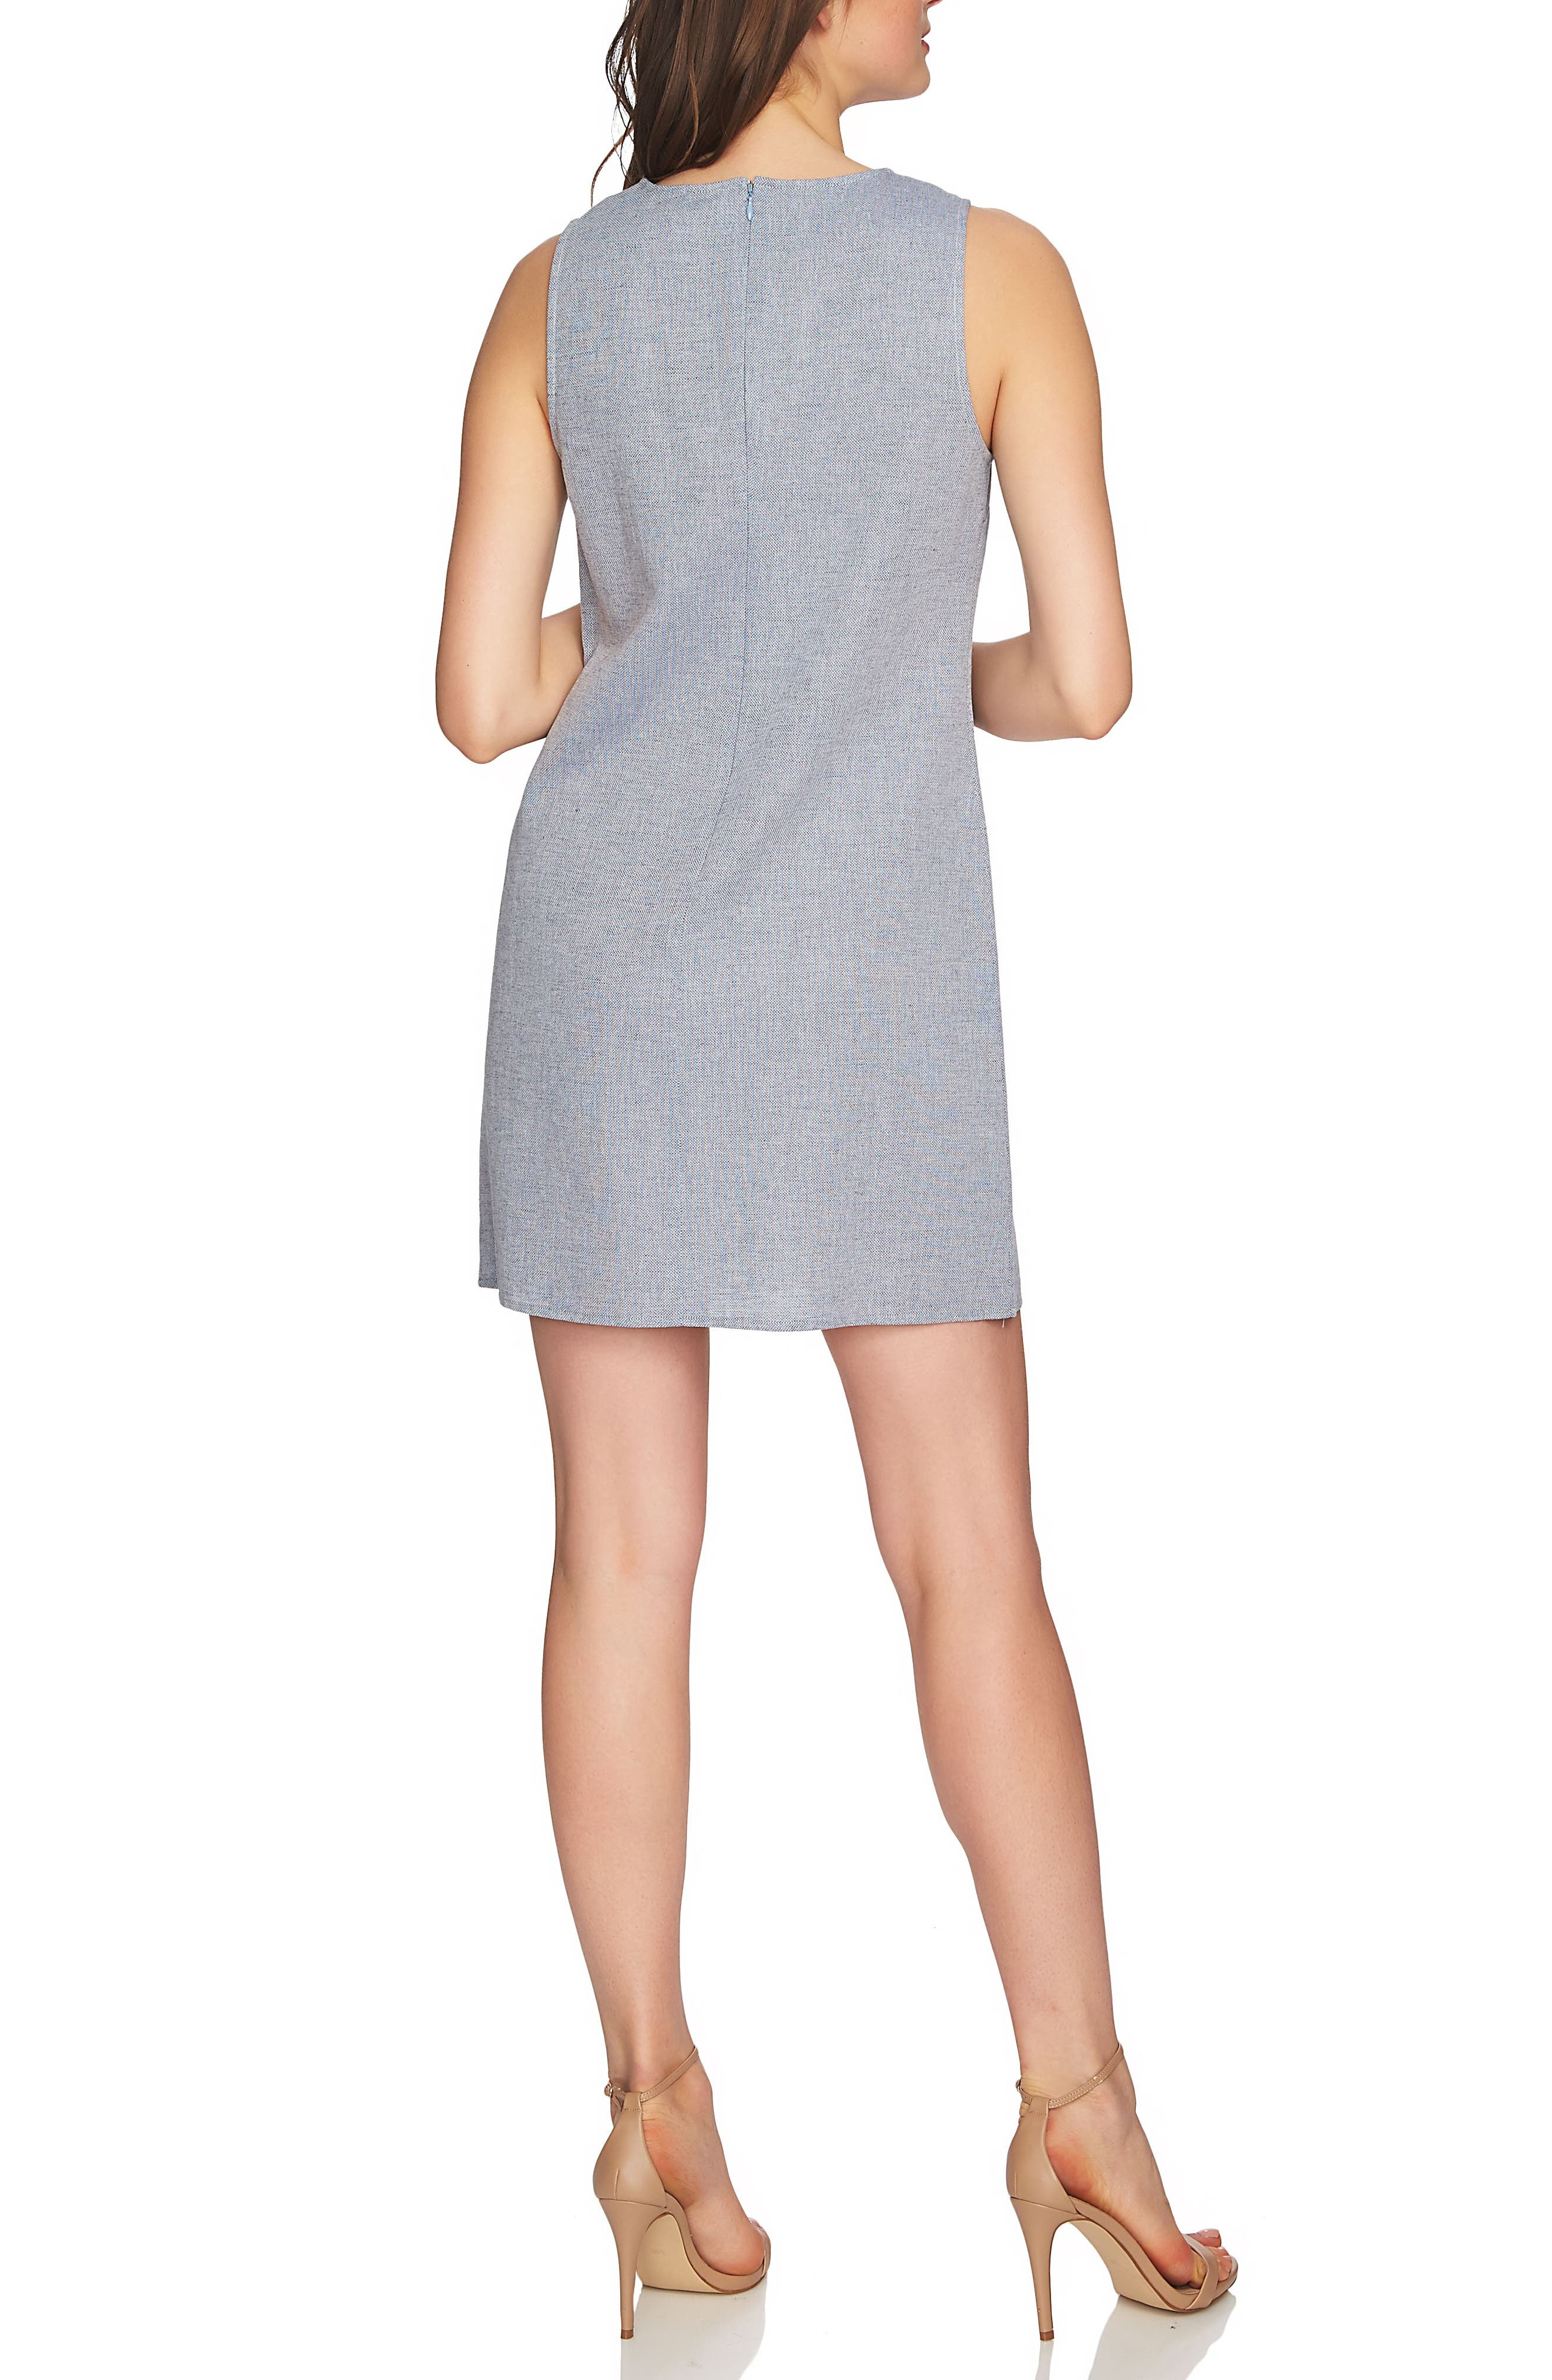 Arlington Sleeveless Embroidered Shift Dress,                             Alternate thumbnail 2, color,                             420